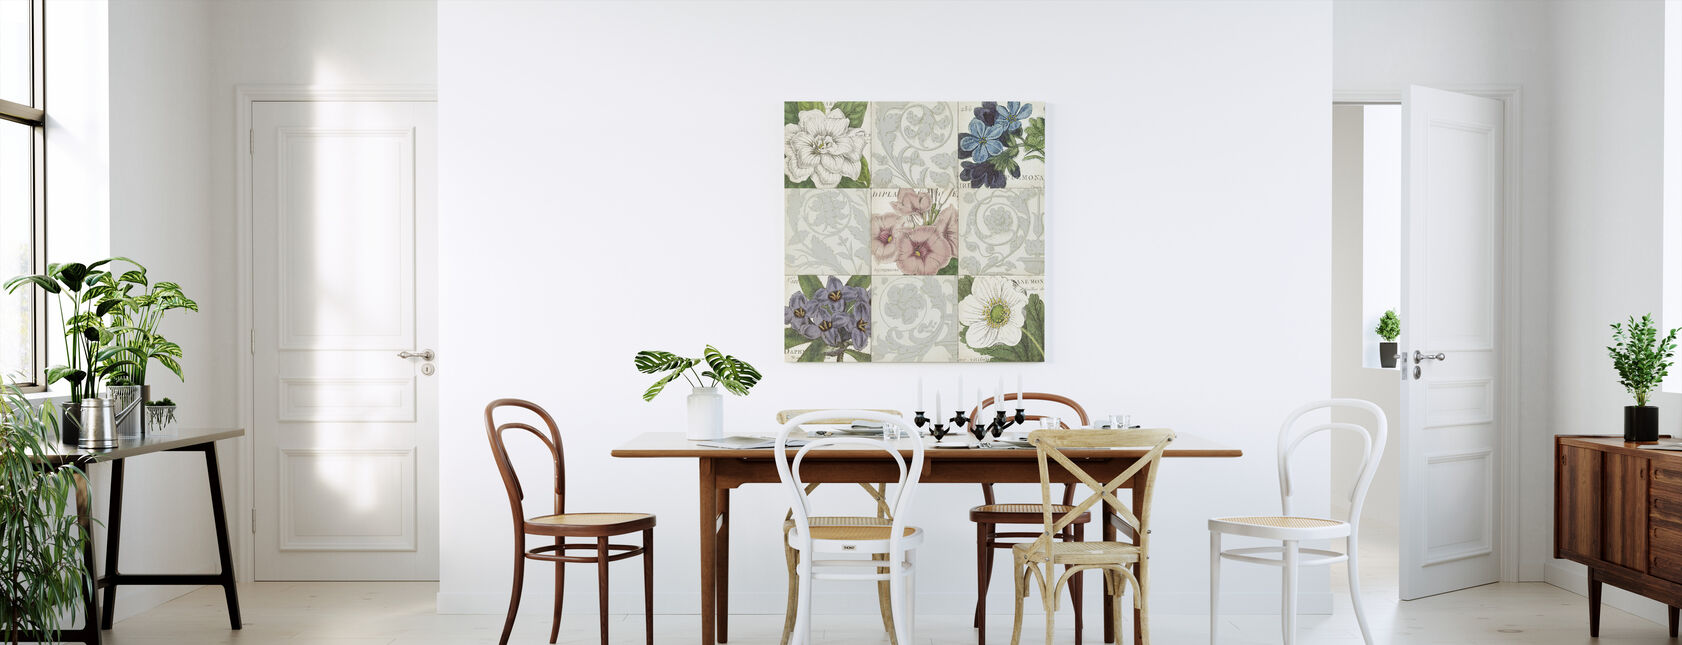 Botanics of I talie - Canvas print - Kitchen